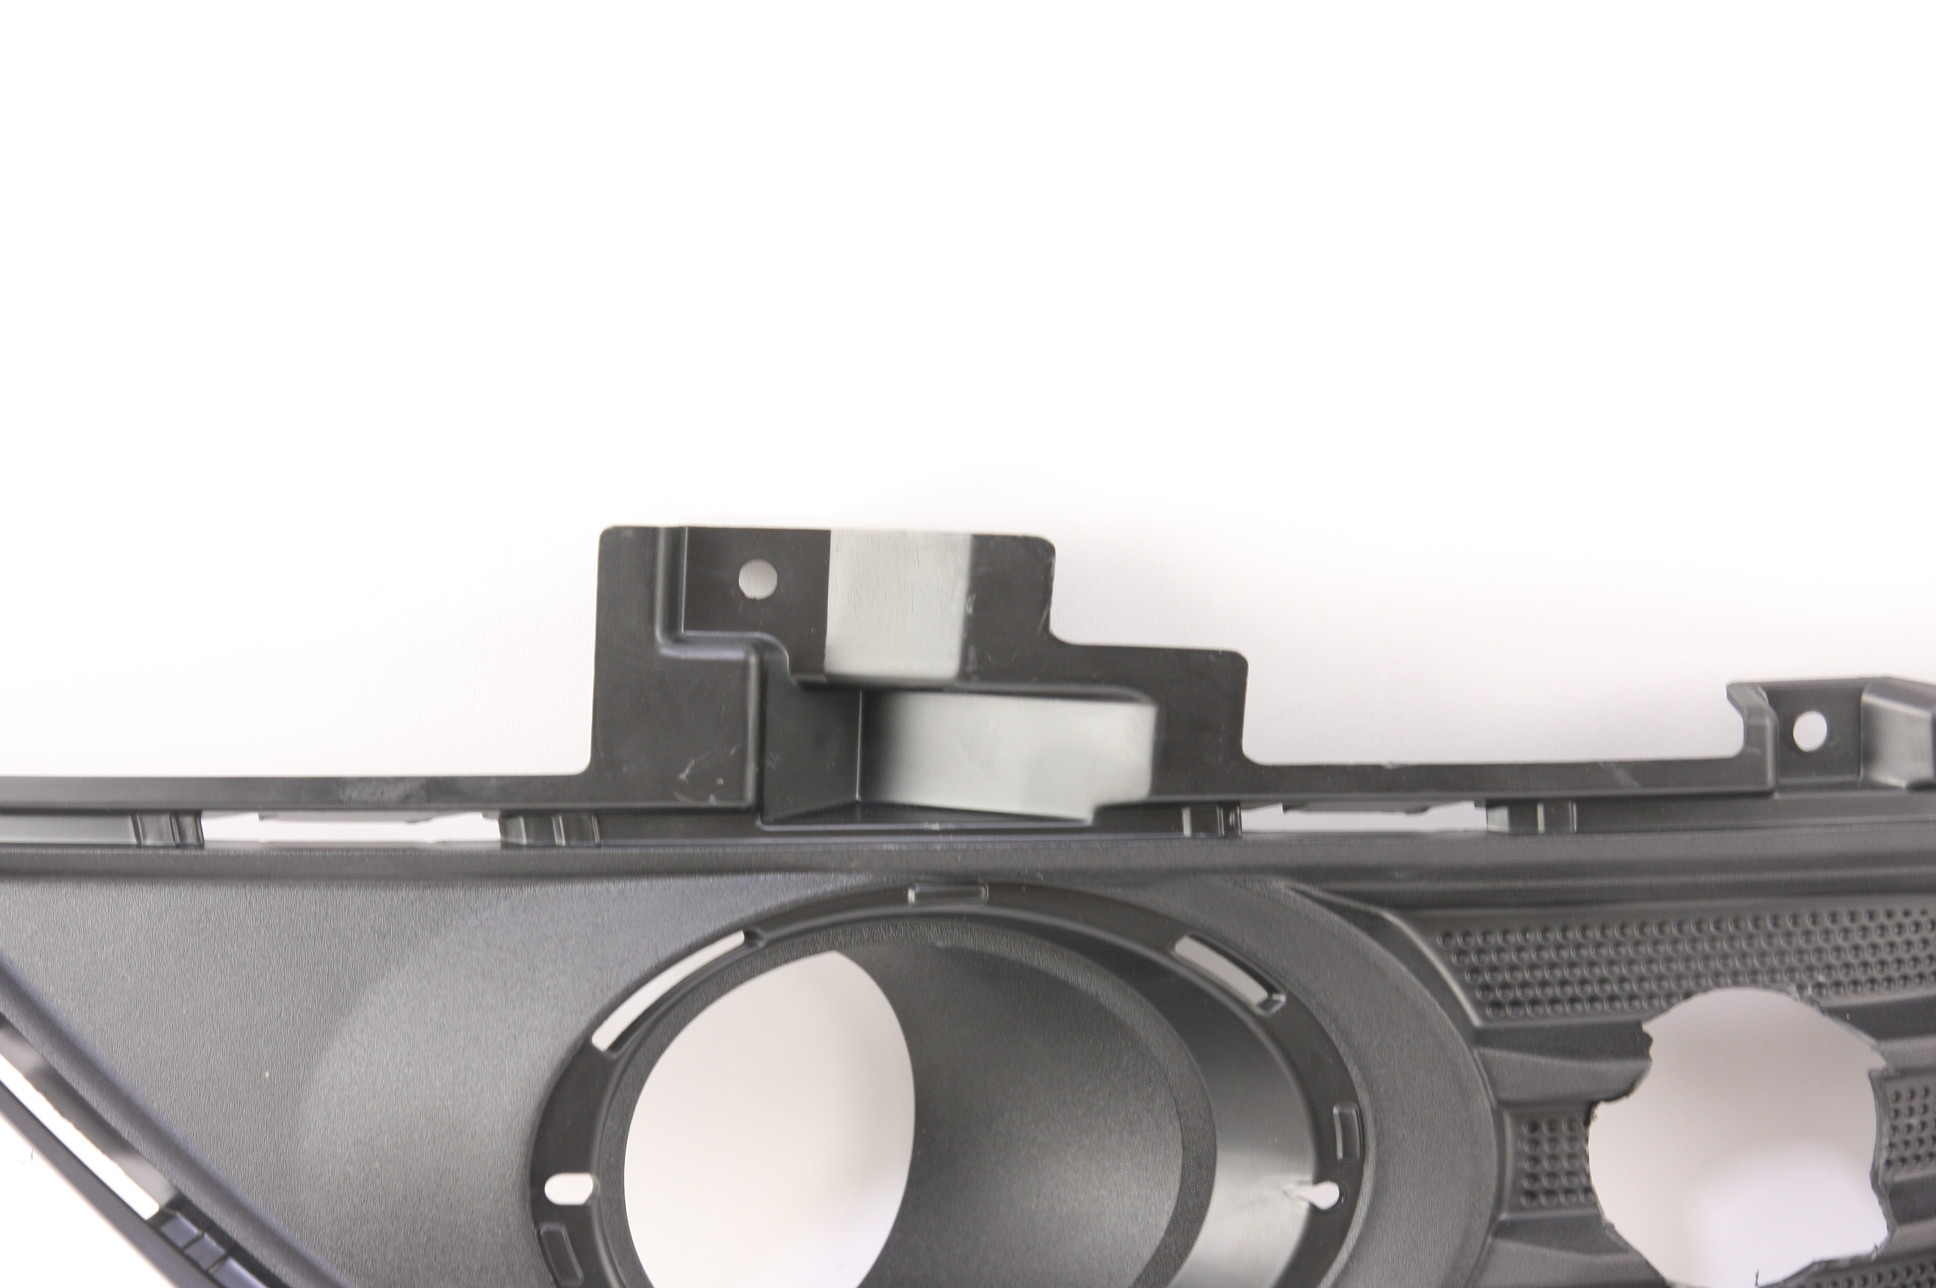 **** New OEM DS7Z17B814GA Ford 13-16 Fusion Front Fog Bumper Grille Side Trim LH - image 3